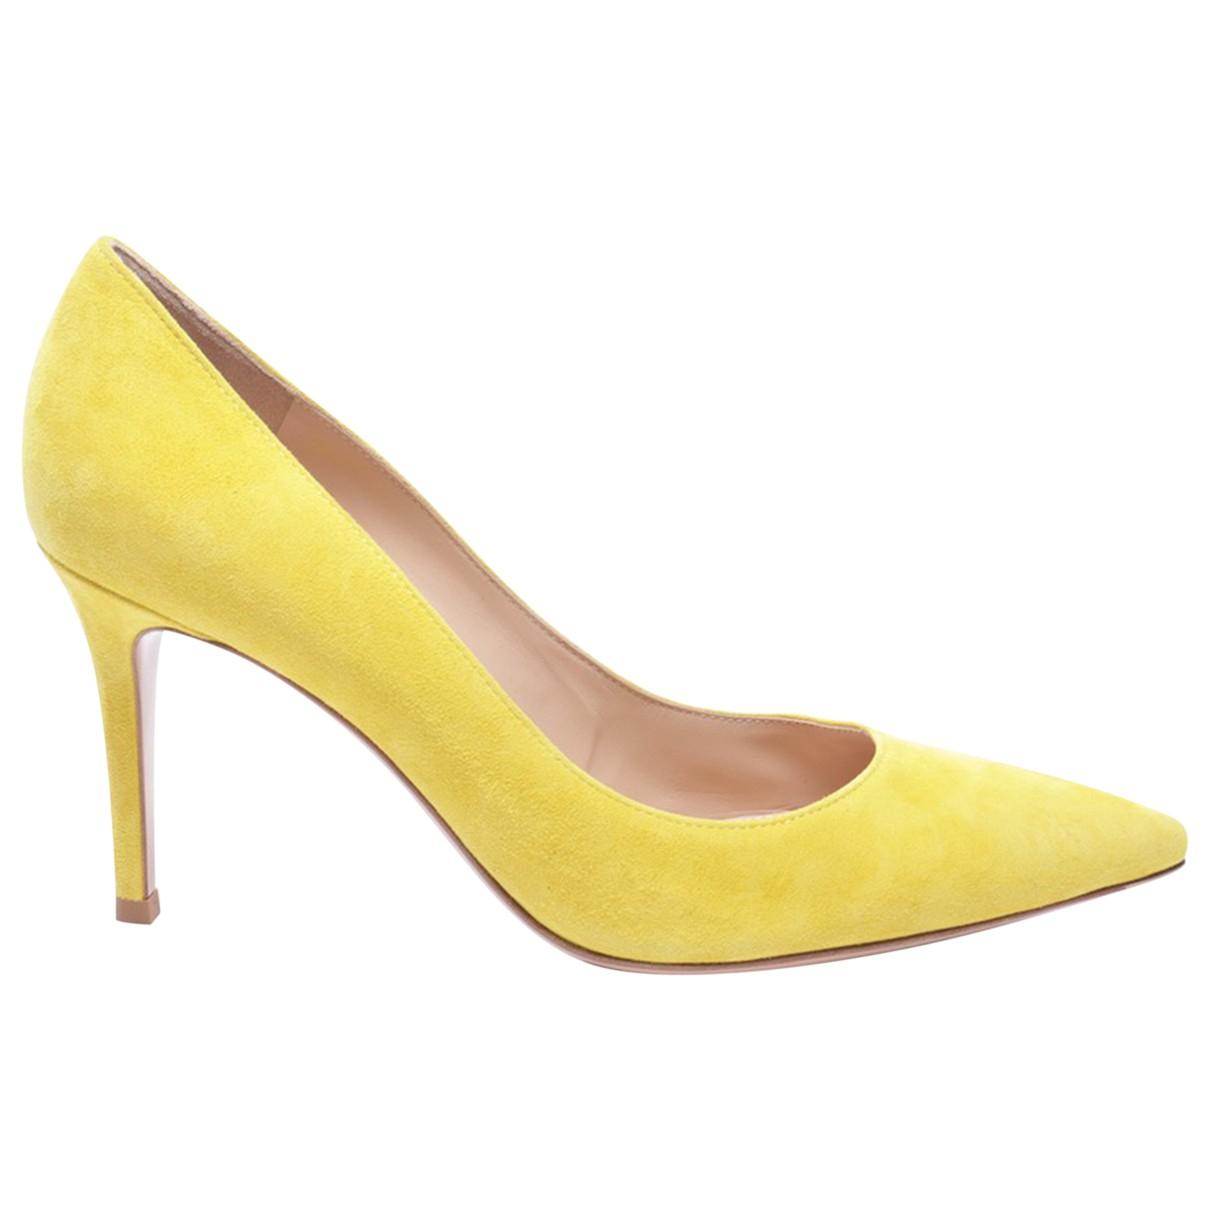 Gianvito Rossi \N Yellow Leather Heels for Women 38 EU